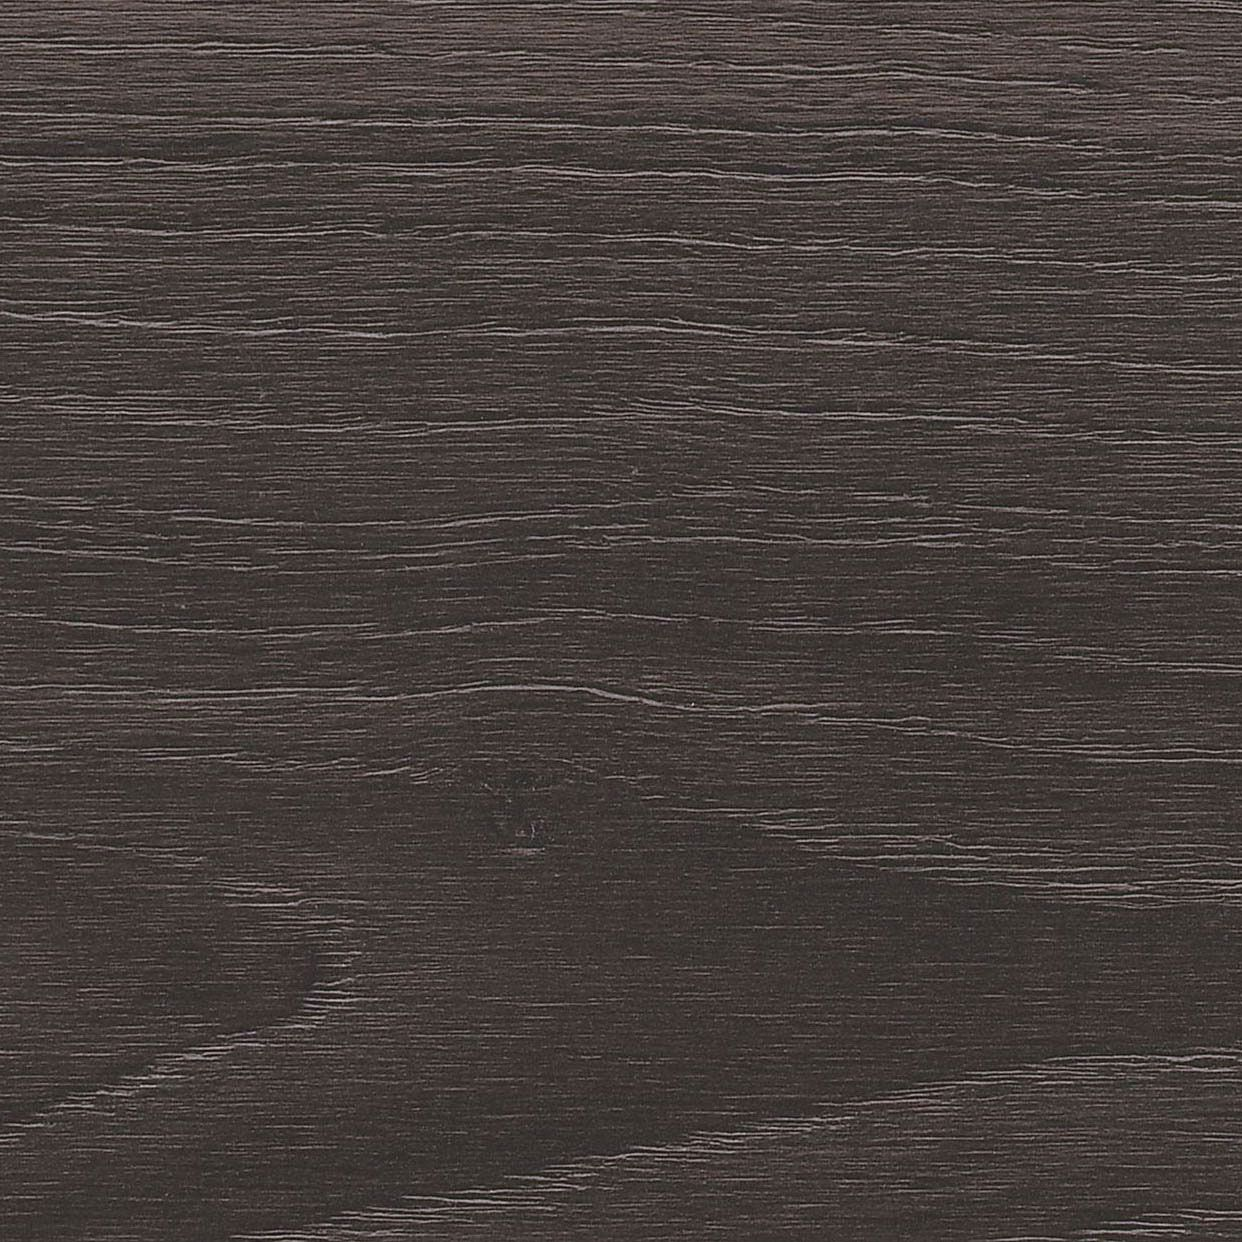 Toccata Natural Victoria Oak Effect Laminate Flooring 1 65 M² Sample Departments Diy At B Q